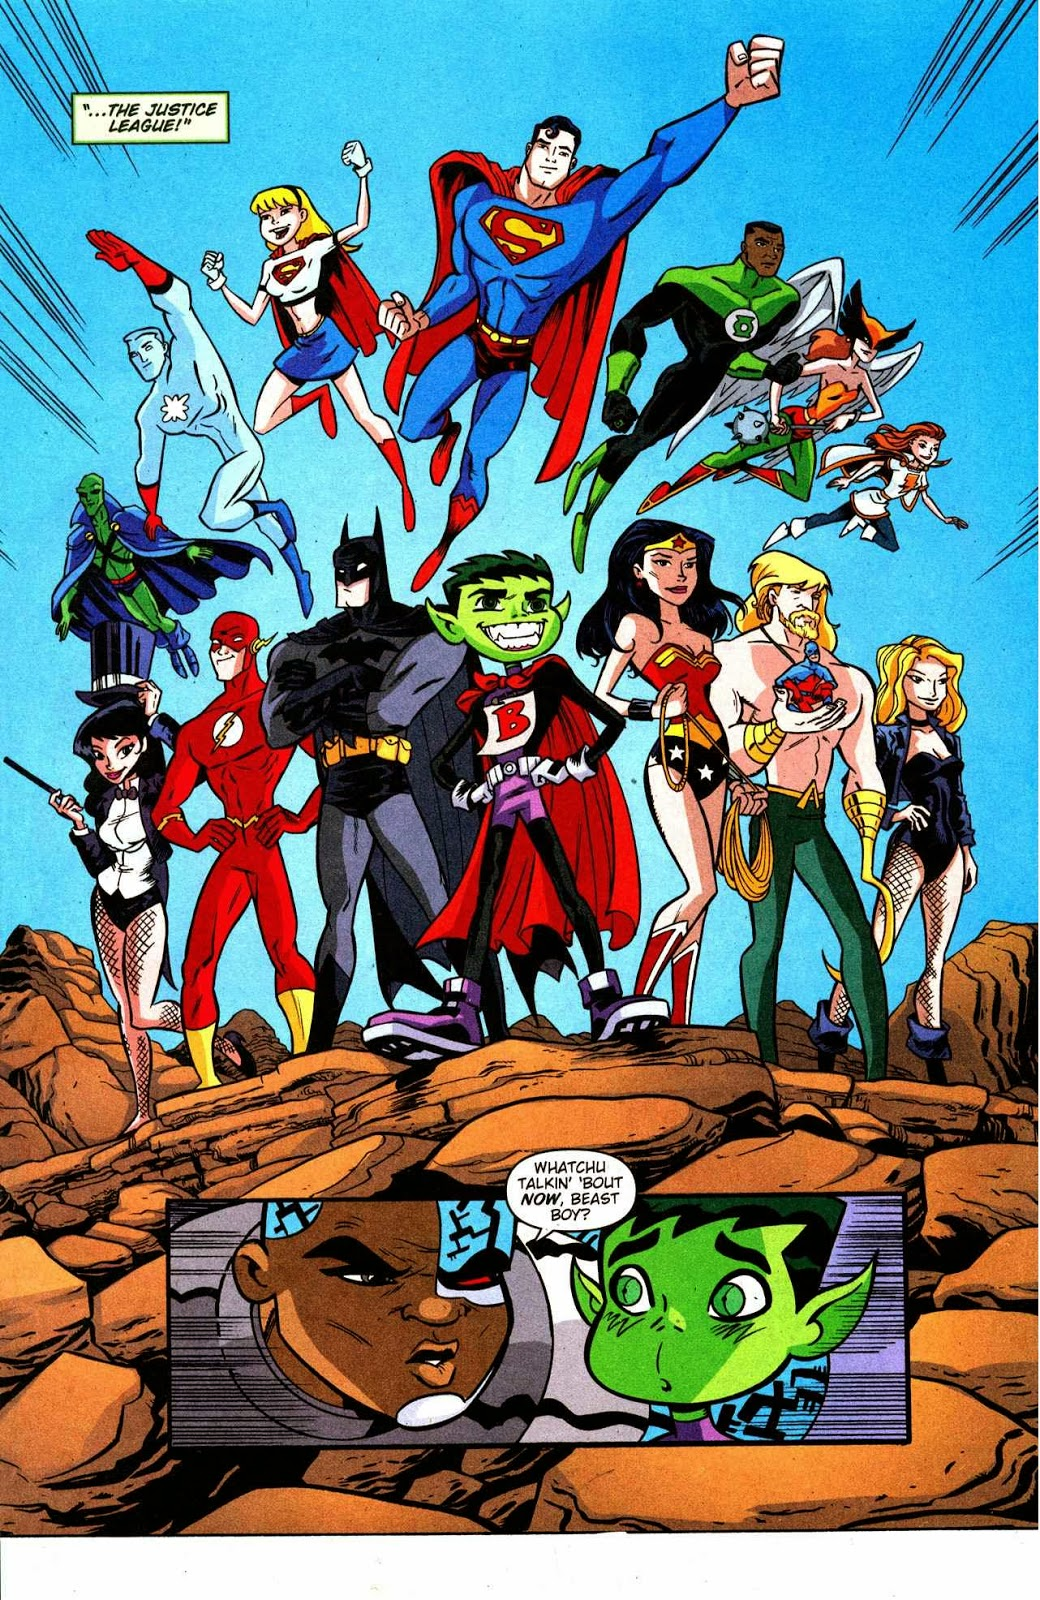 Cyborg Teen Titans